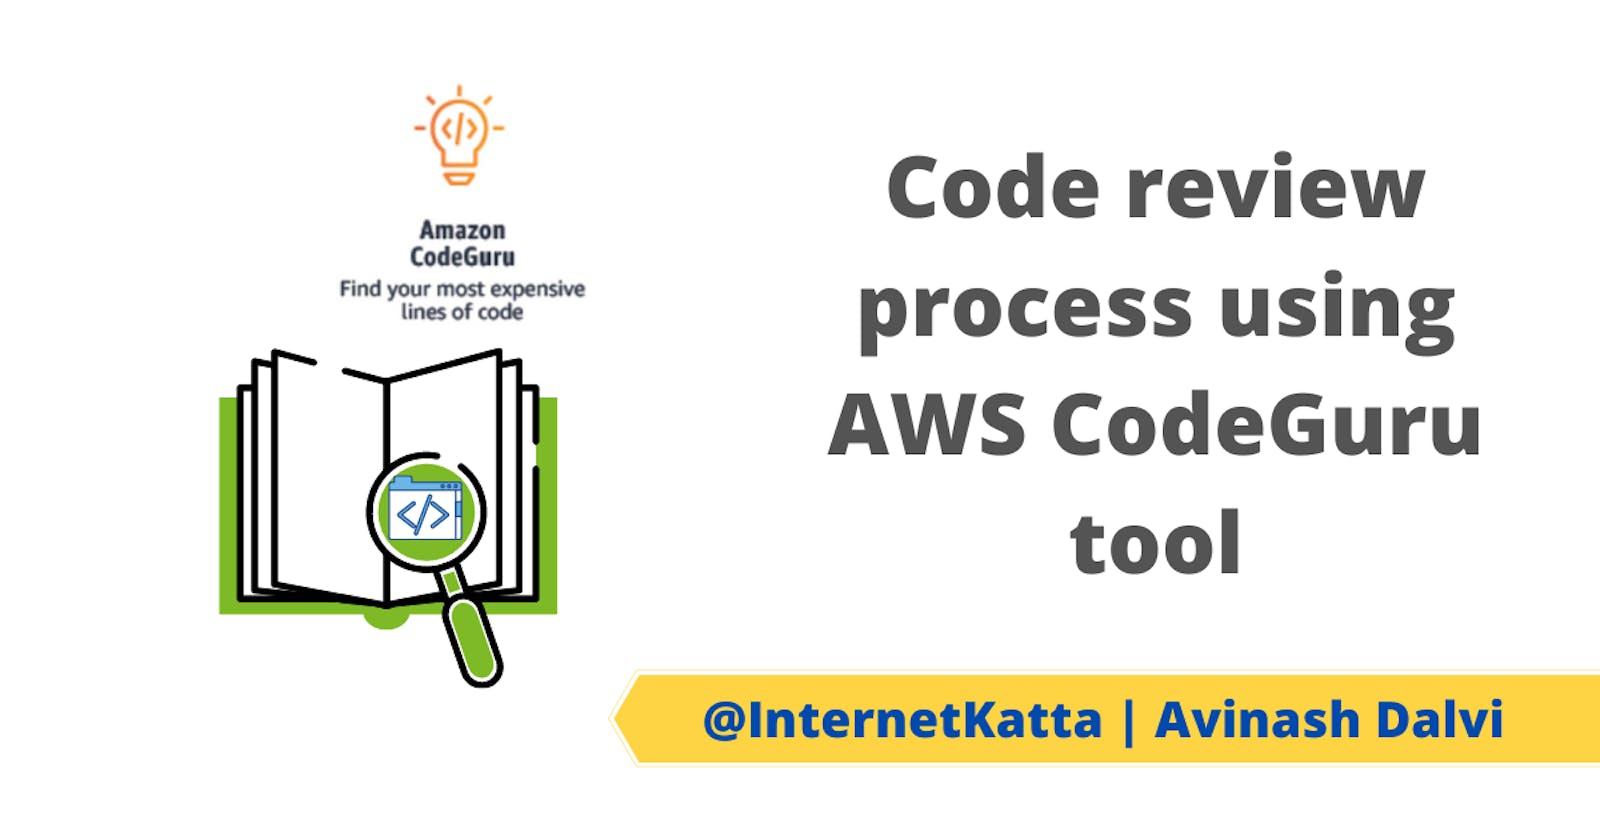 Code review process using AWS CodeGuru tool